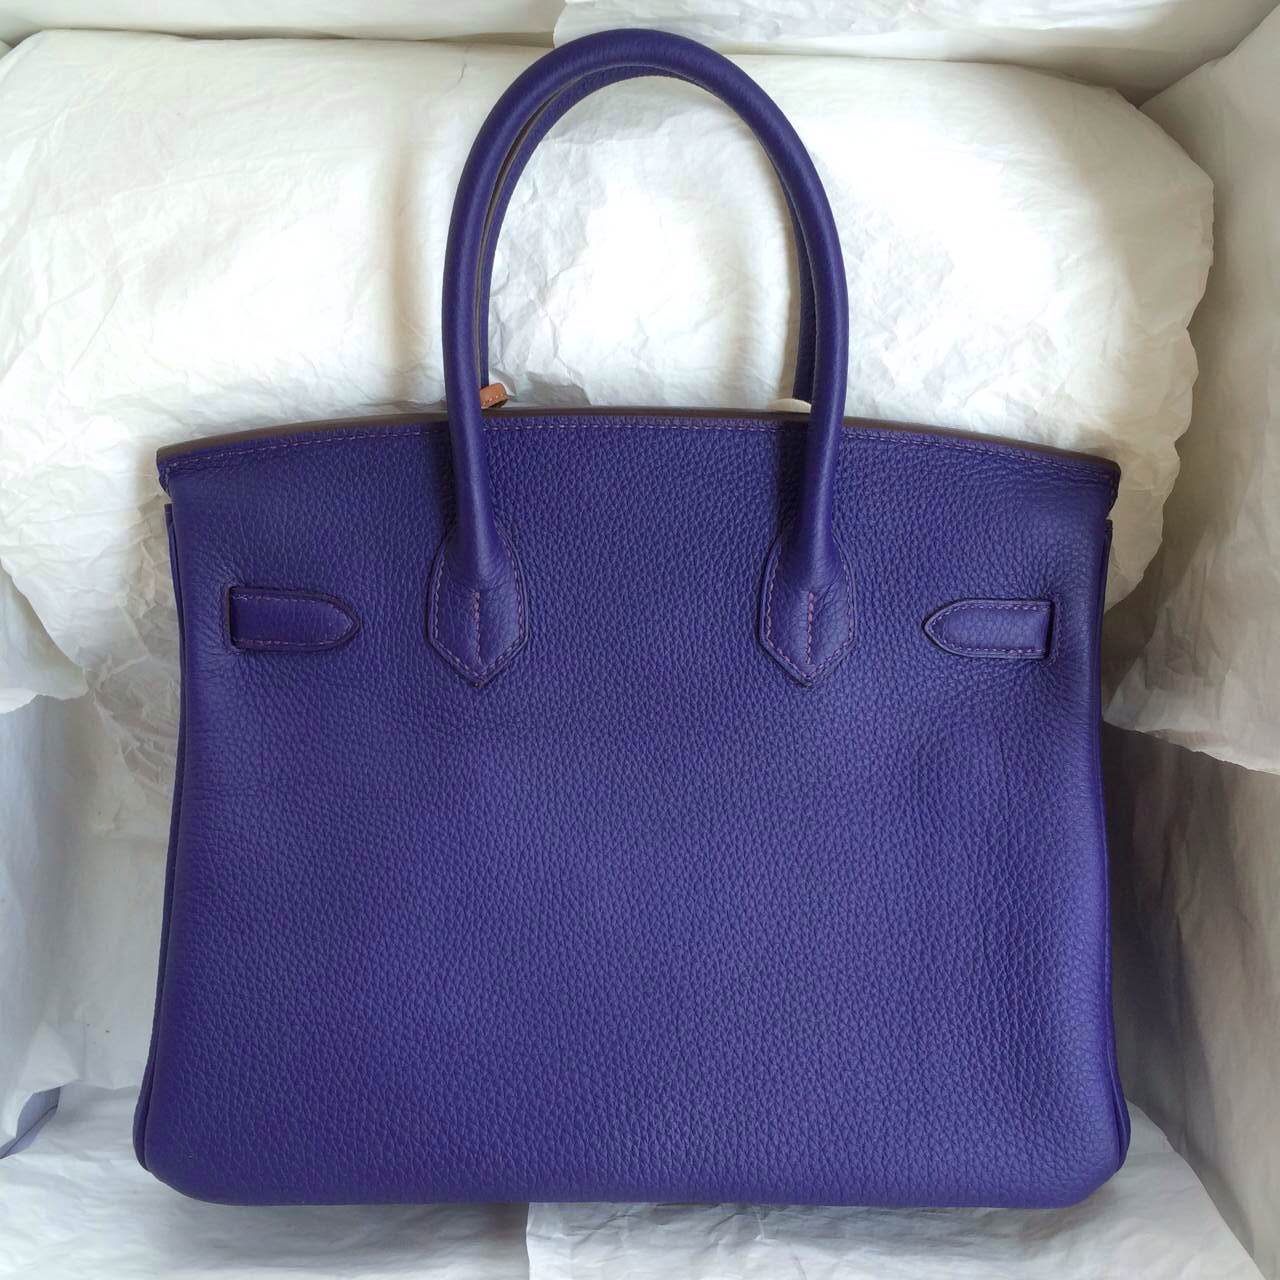 9K Iris Purple Hermes Birkin Handbags 30cm France Togo Leather